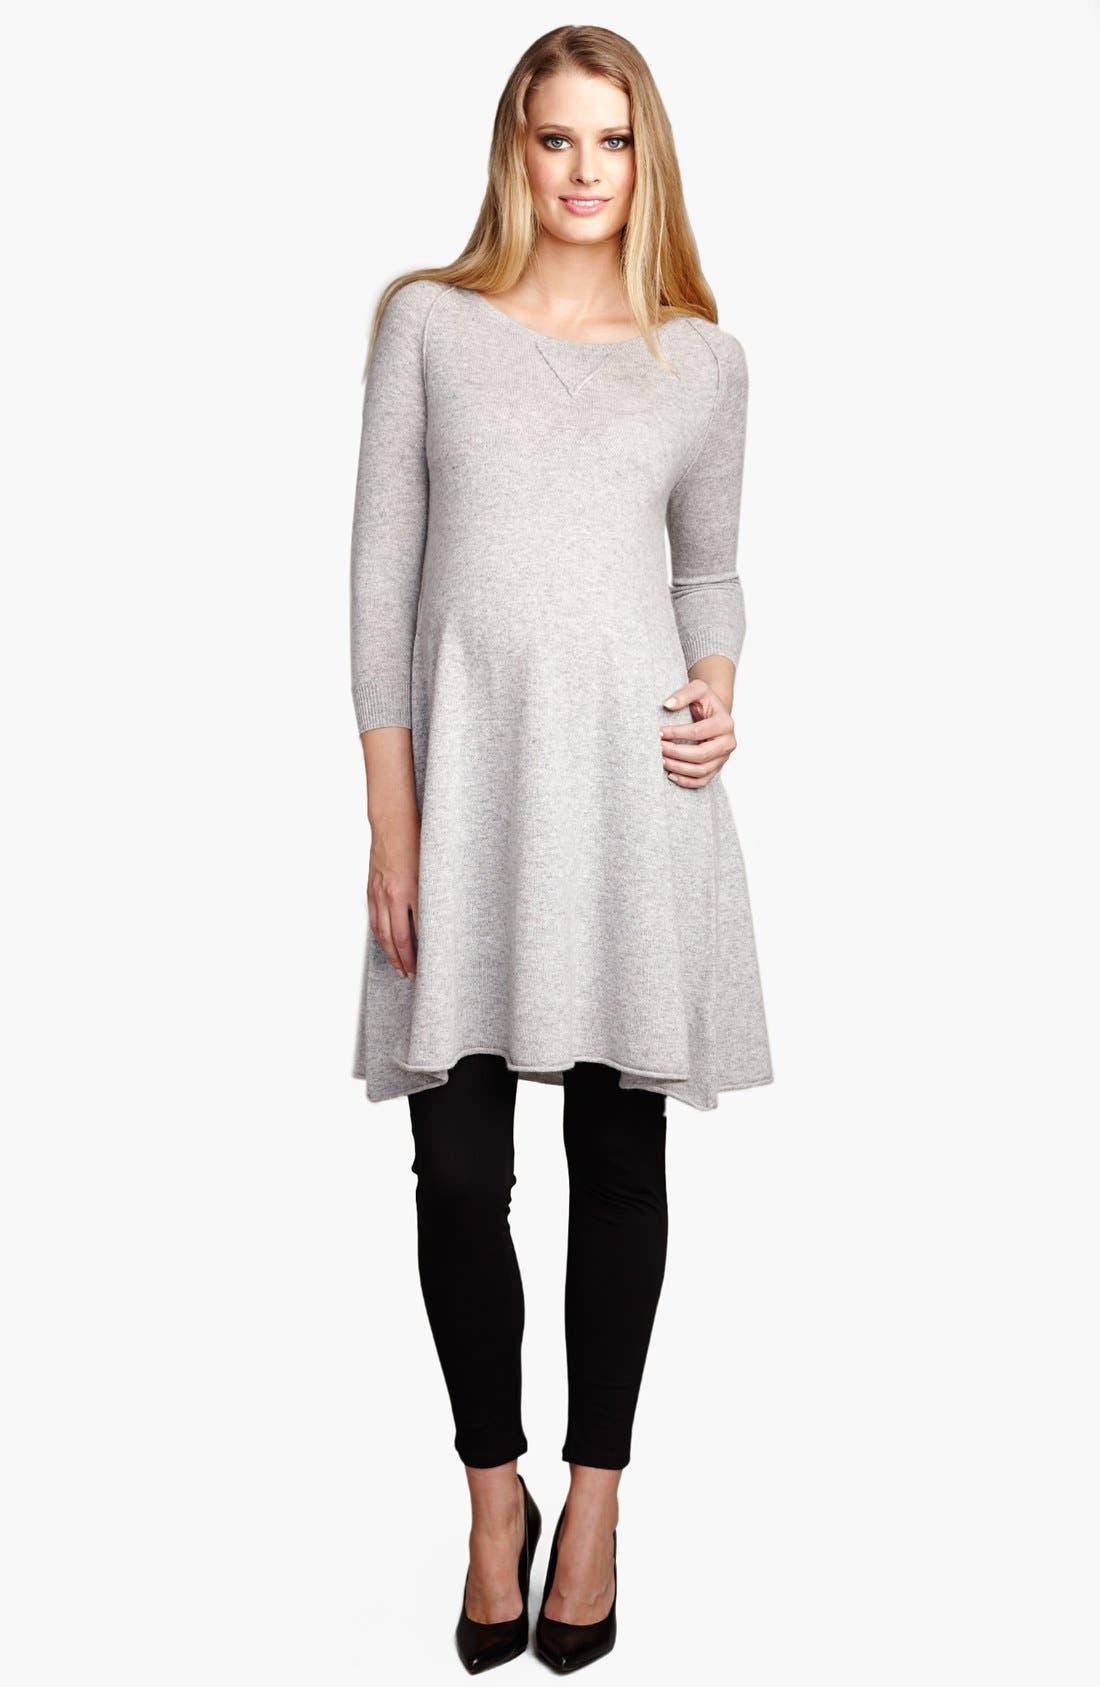 Maternal America Womens Maternity Cashmere Dress